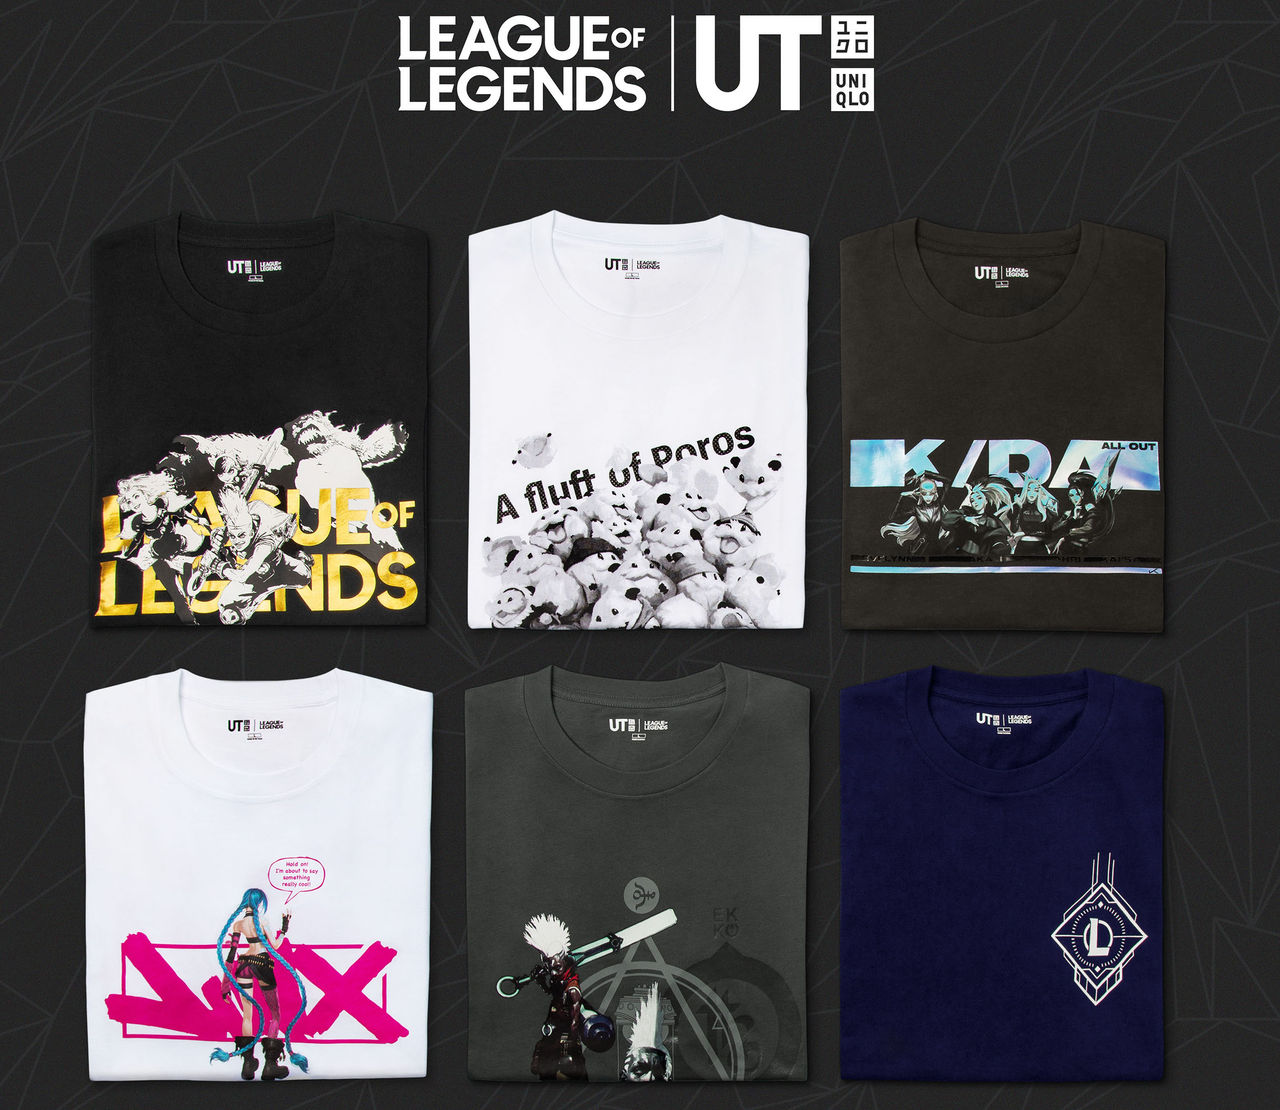 UNIQLO släpper League of Legends-kläder